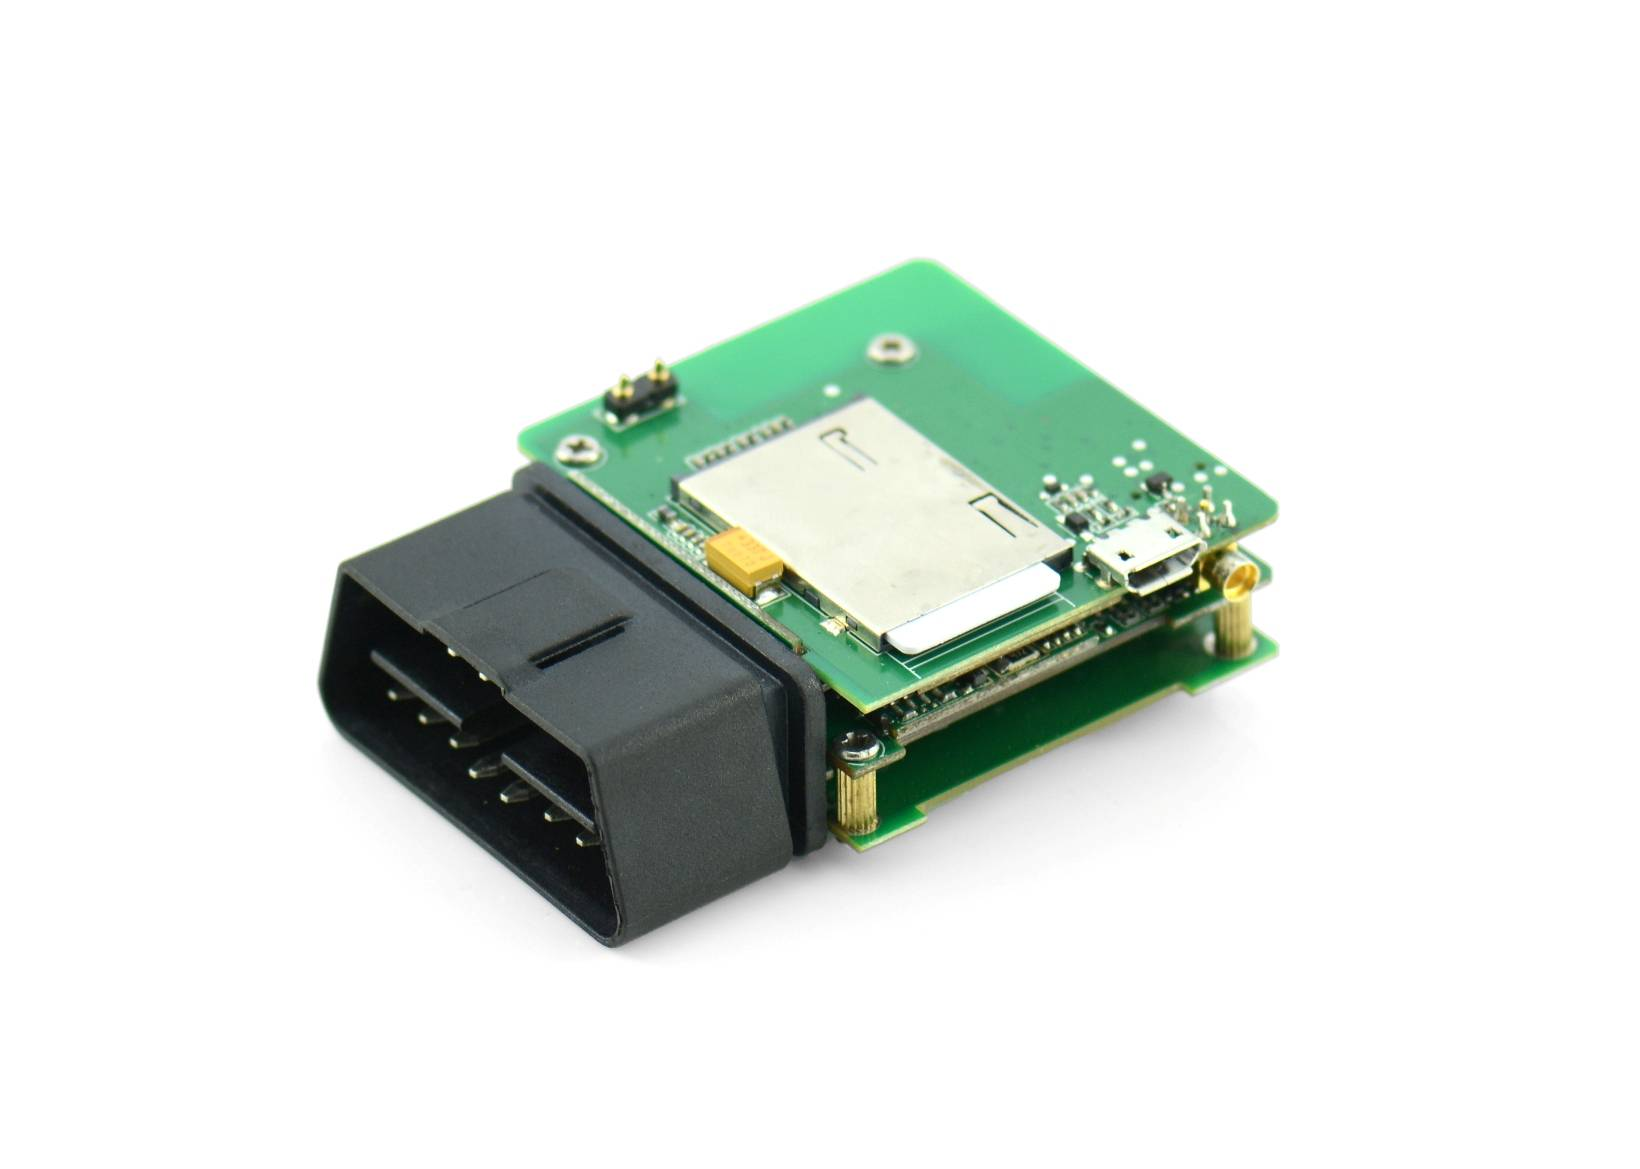 GSM OBD GPS Tracker